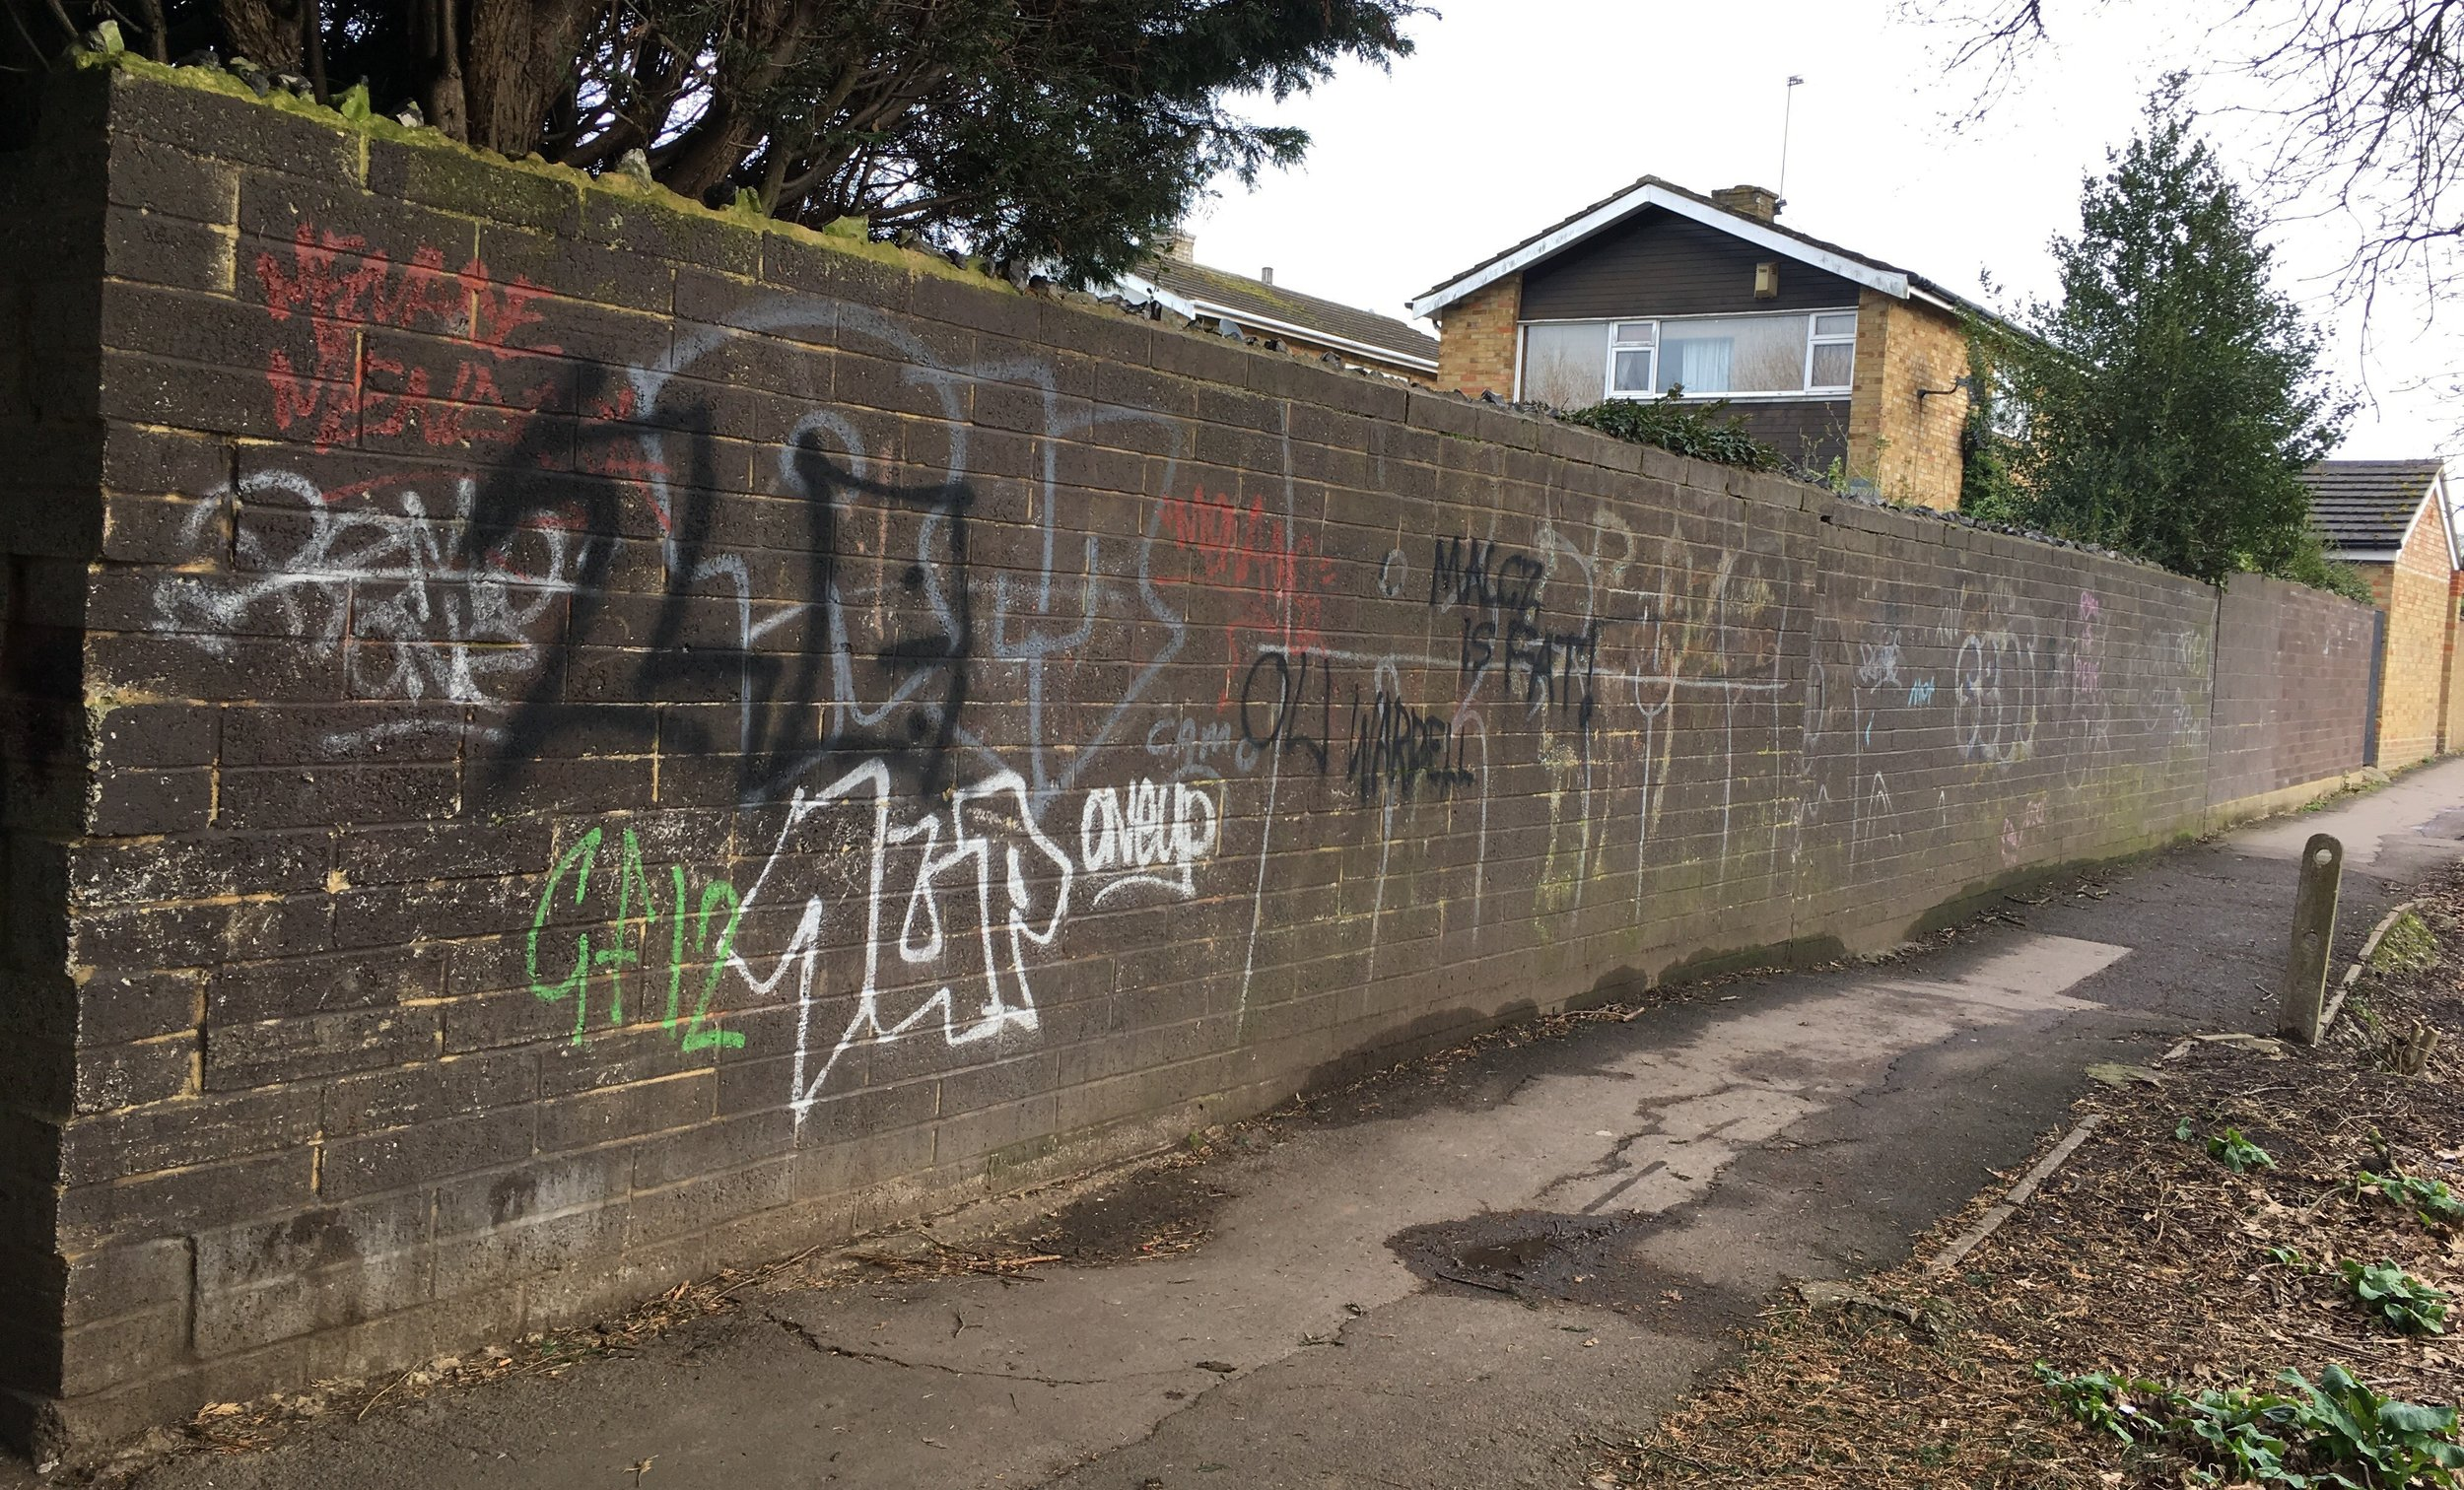 Wall before street art